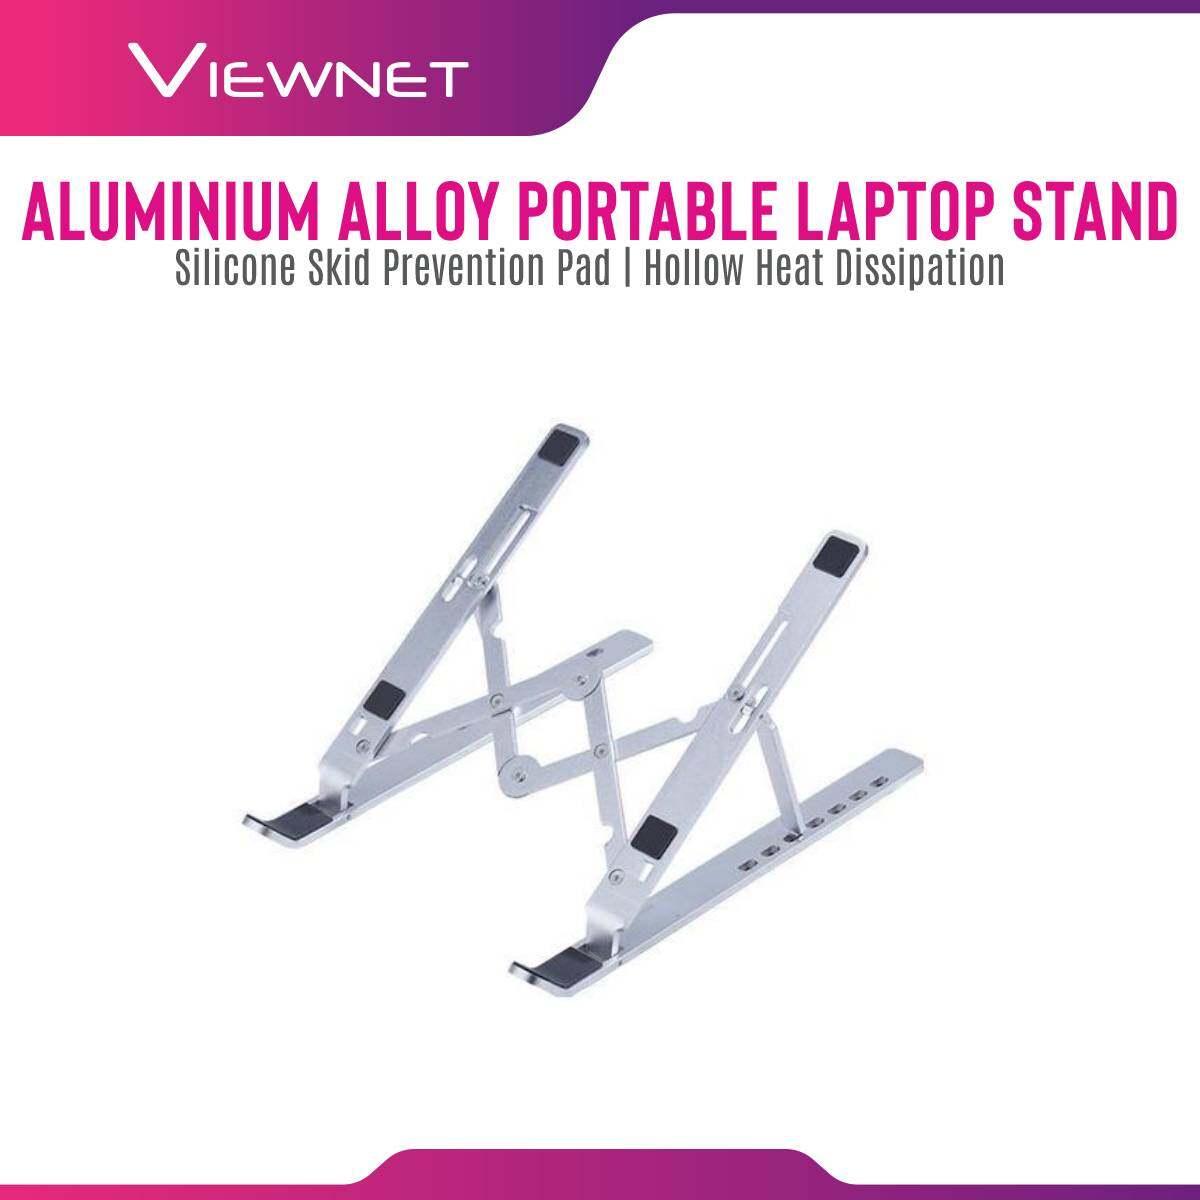 Aluminium Alloy Portable Laptop Stand Adjustable Foldable Laptop Holder Non-Slip Notebook Stand